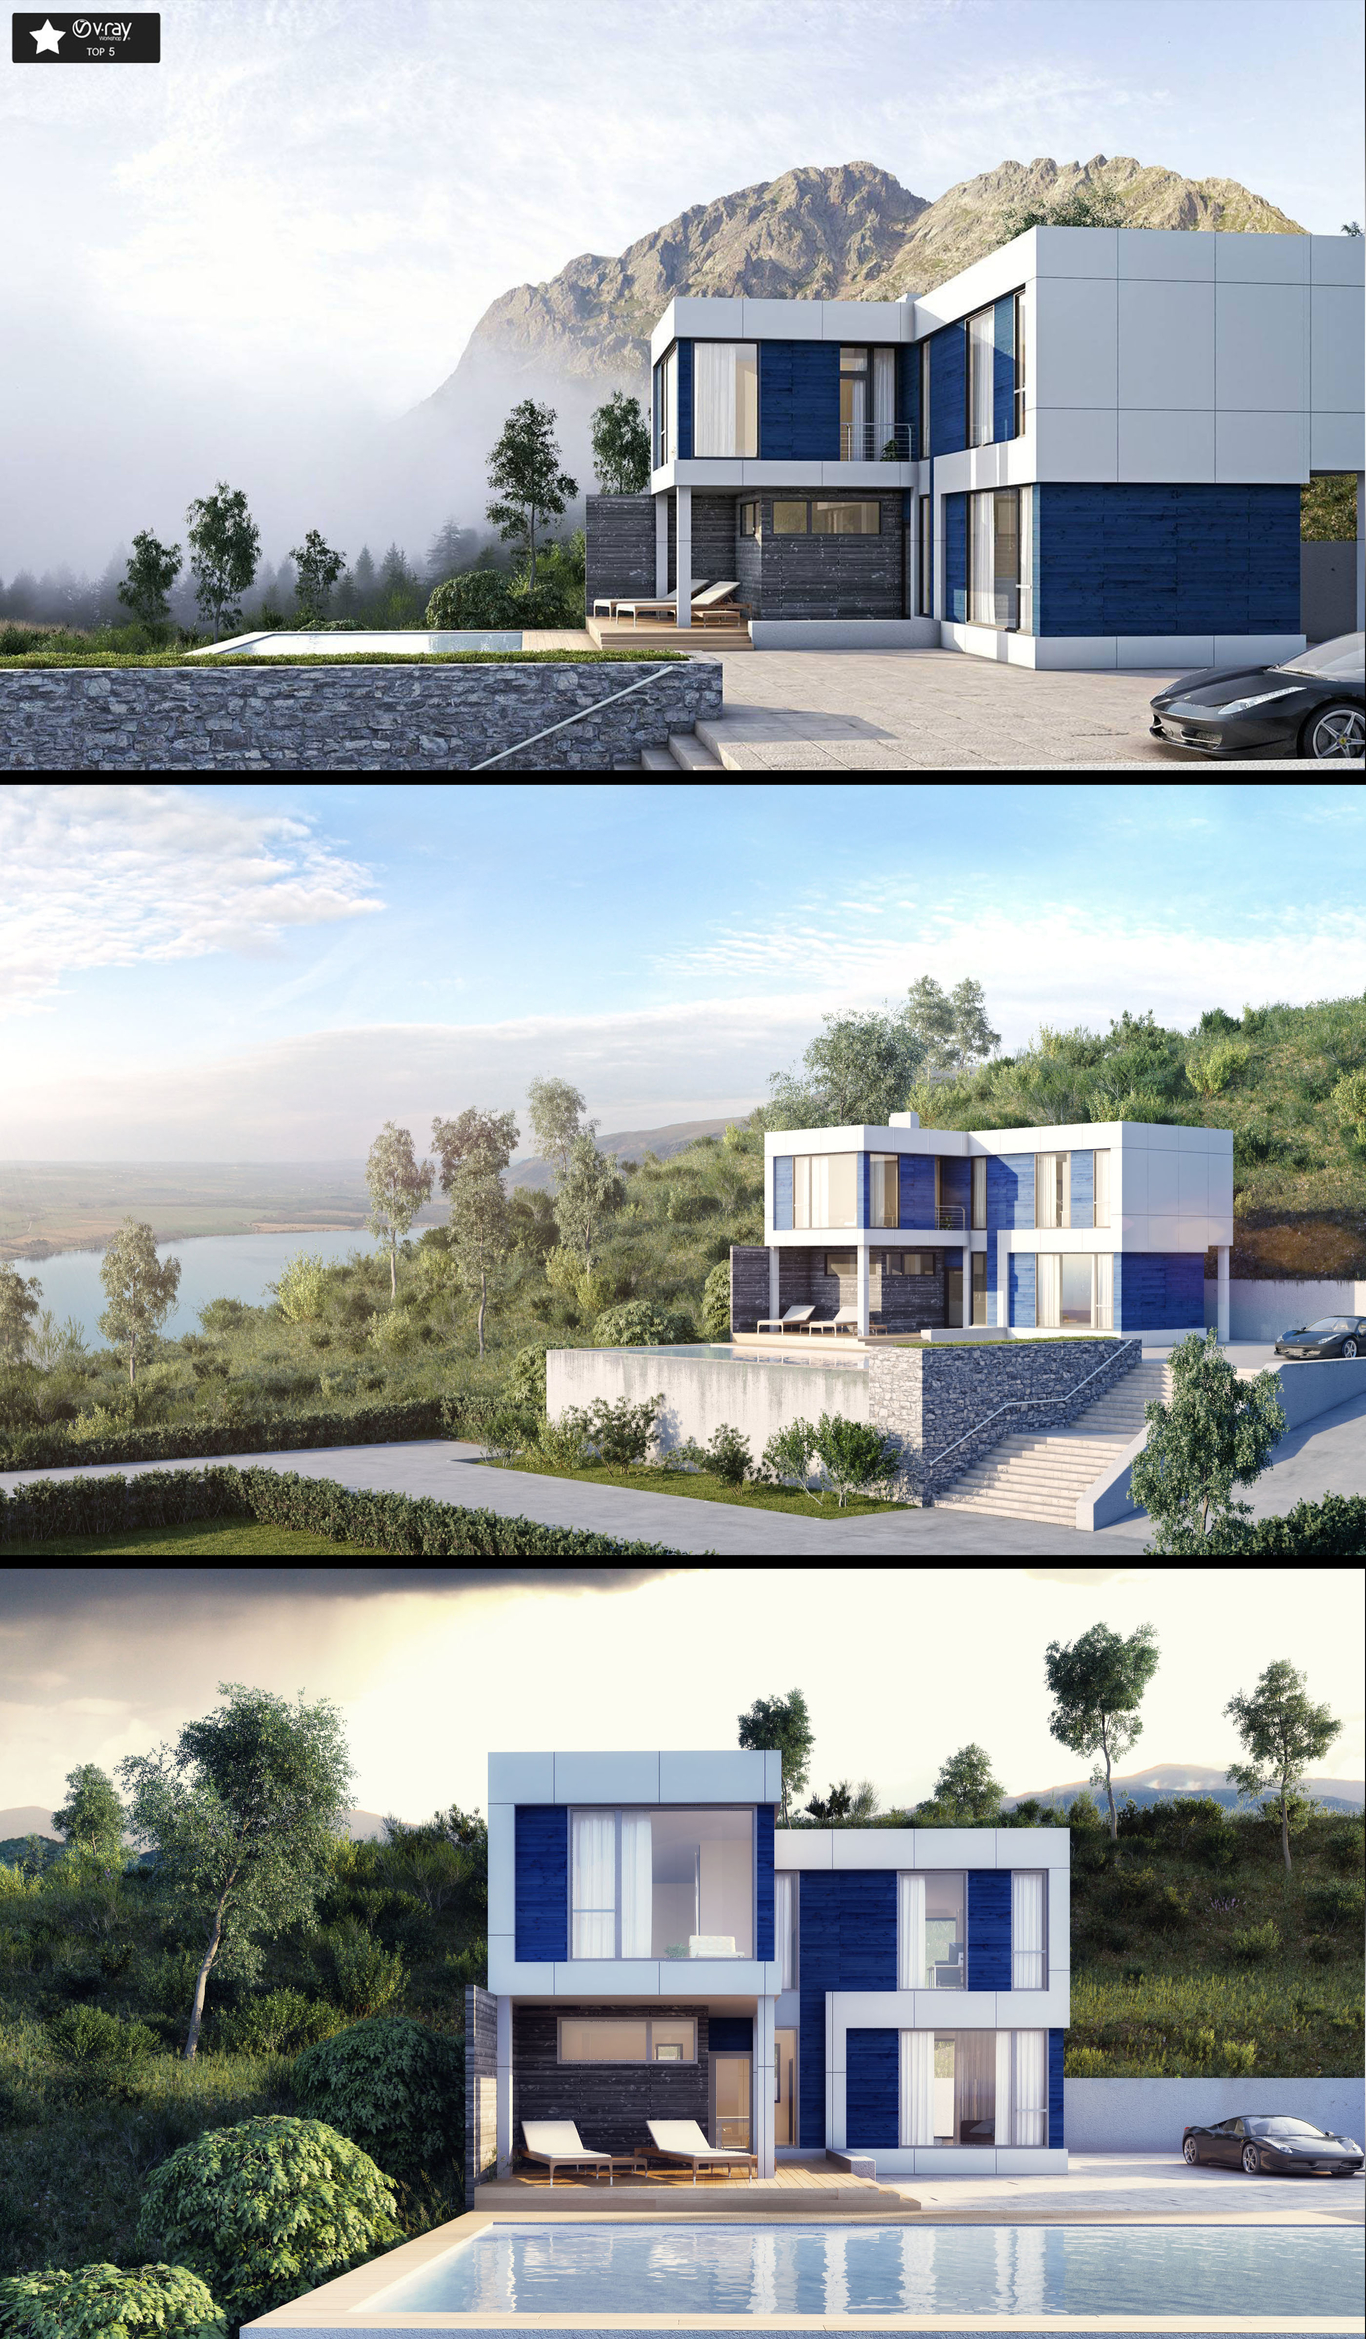 Mixocg prio house 1 c0ffa39f t5vx